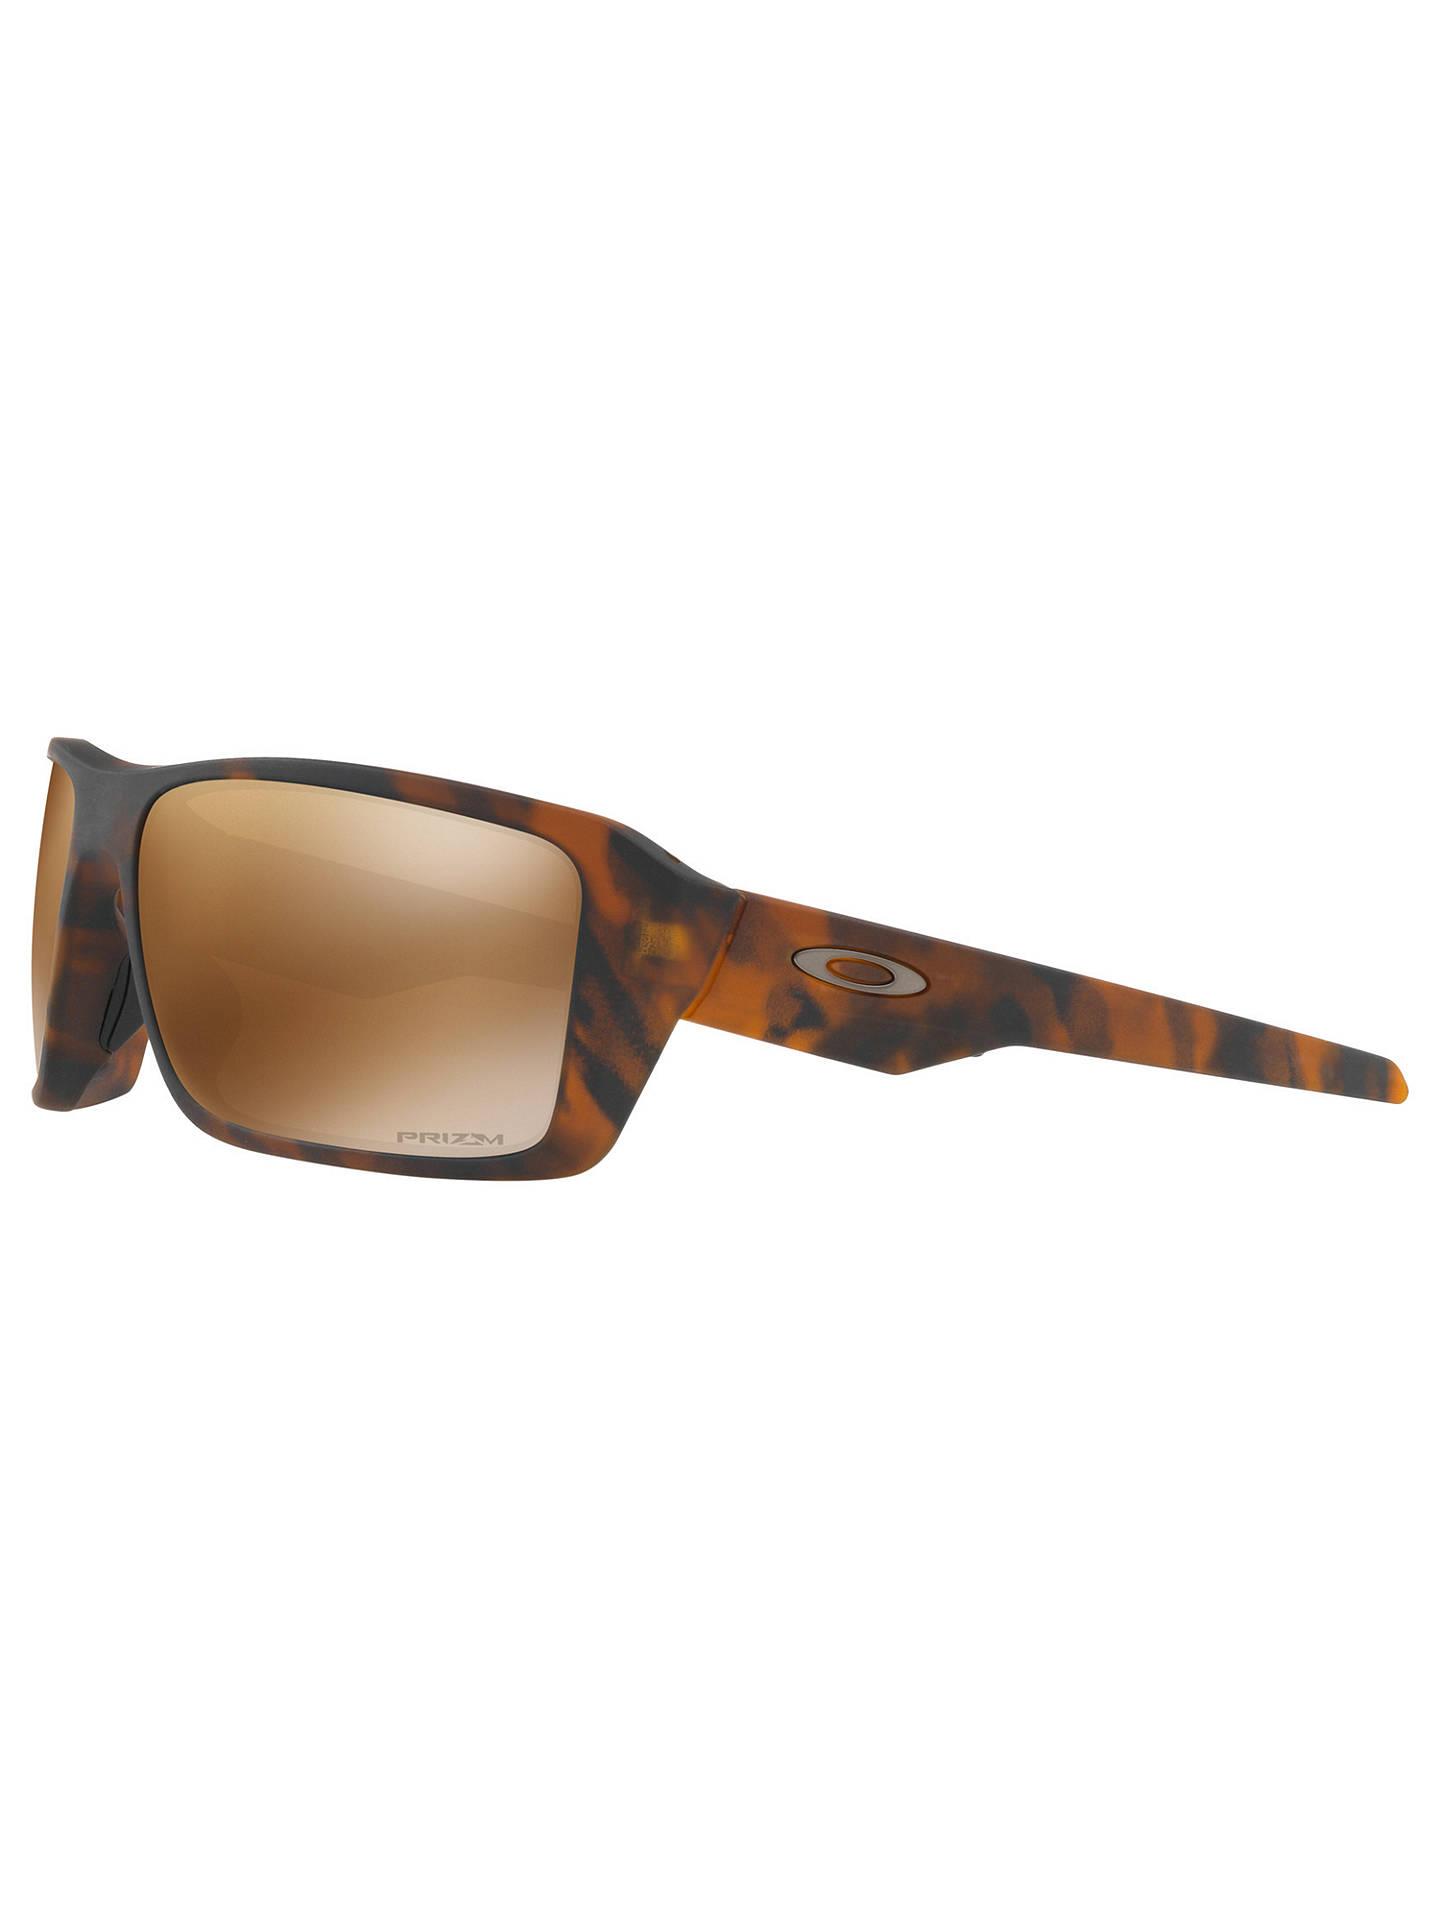 aa6d7242f0 ... Buy Oakley OO9380 Double Edge Prizm Polarised Rectangular Sunglasses